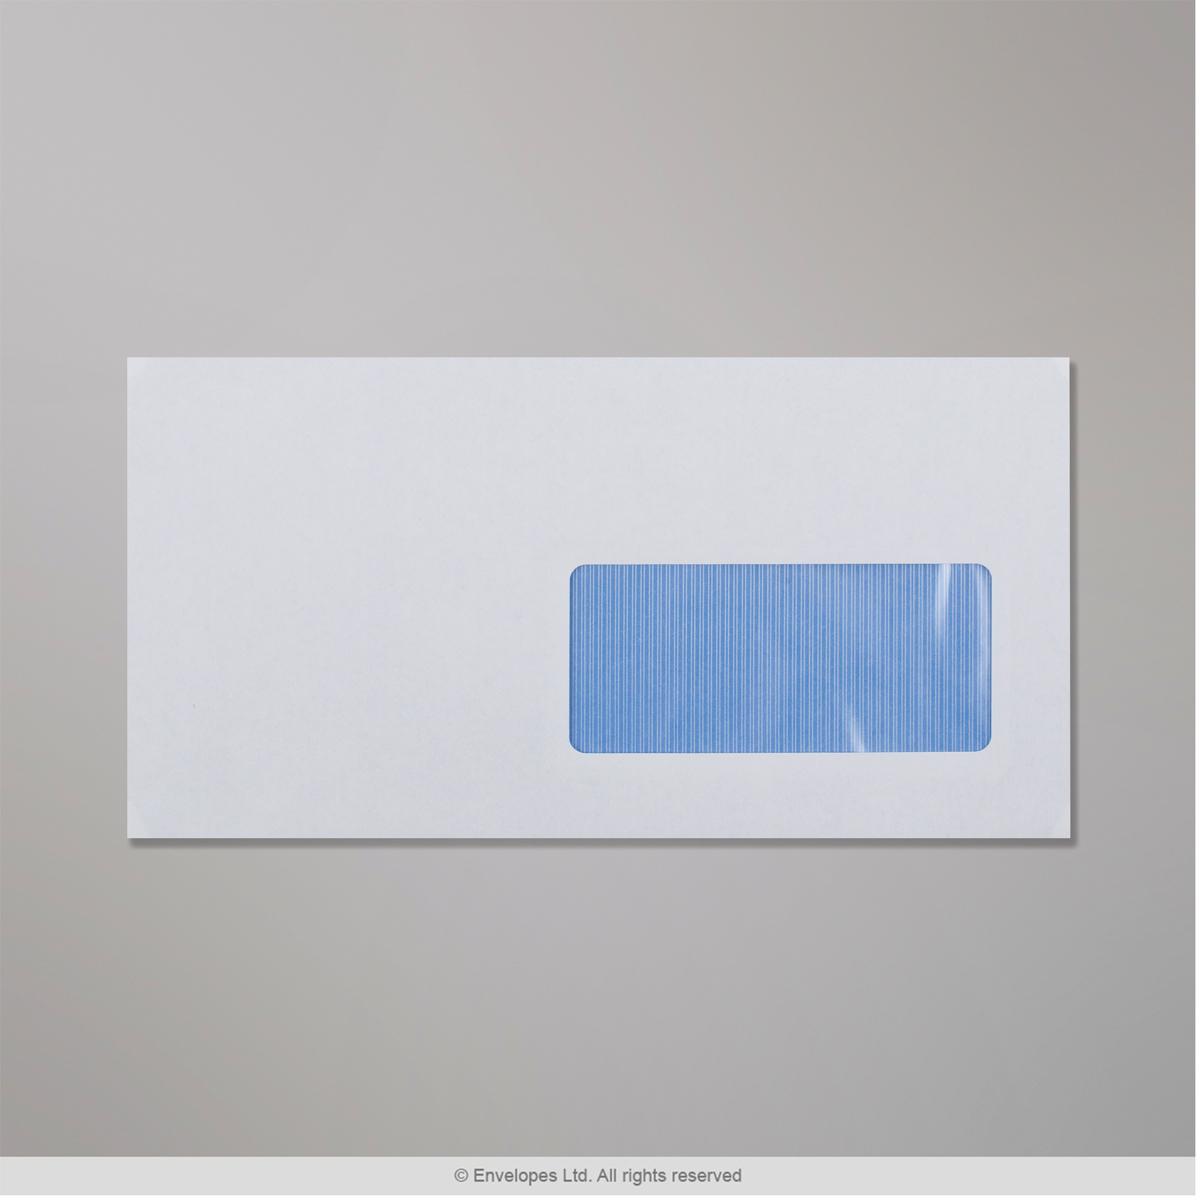 115x225 mm Busta bianca con finestra